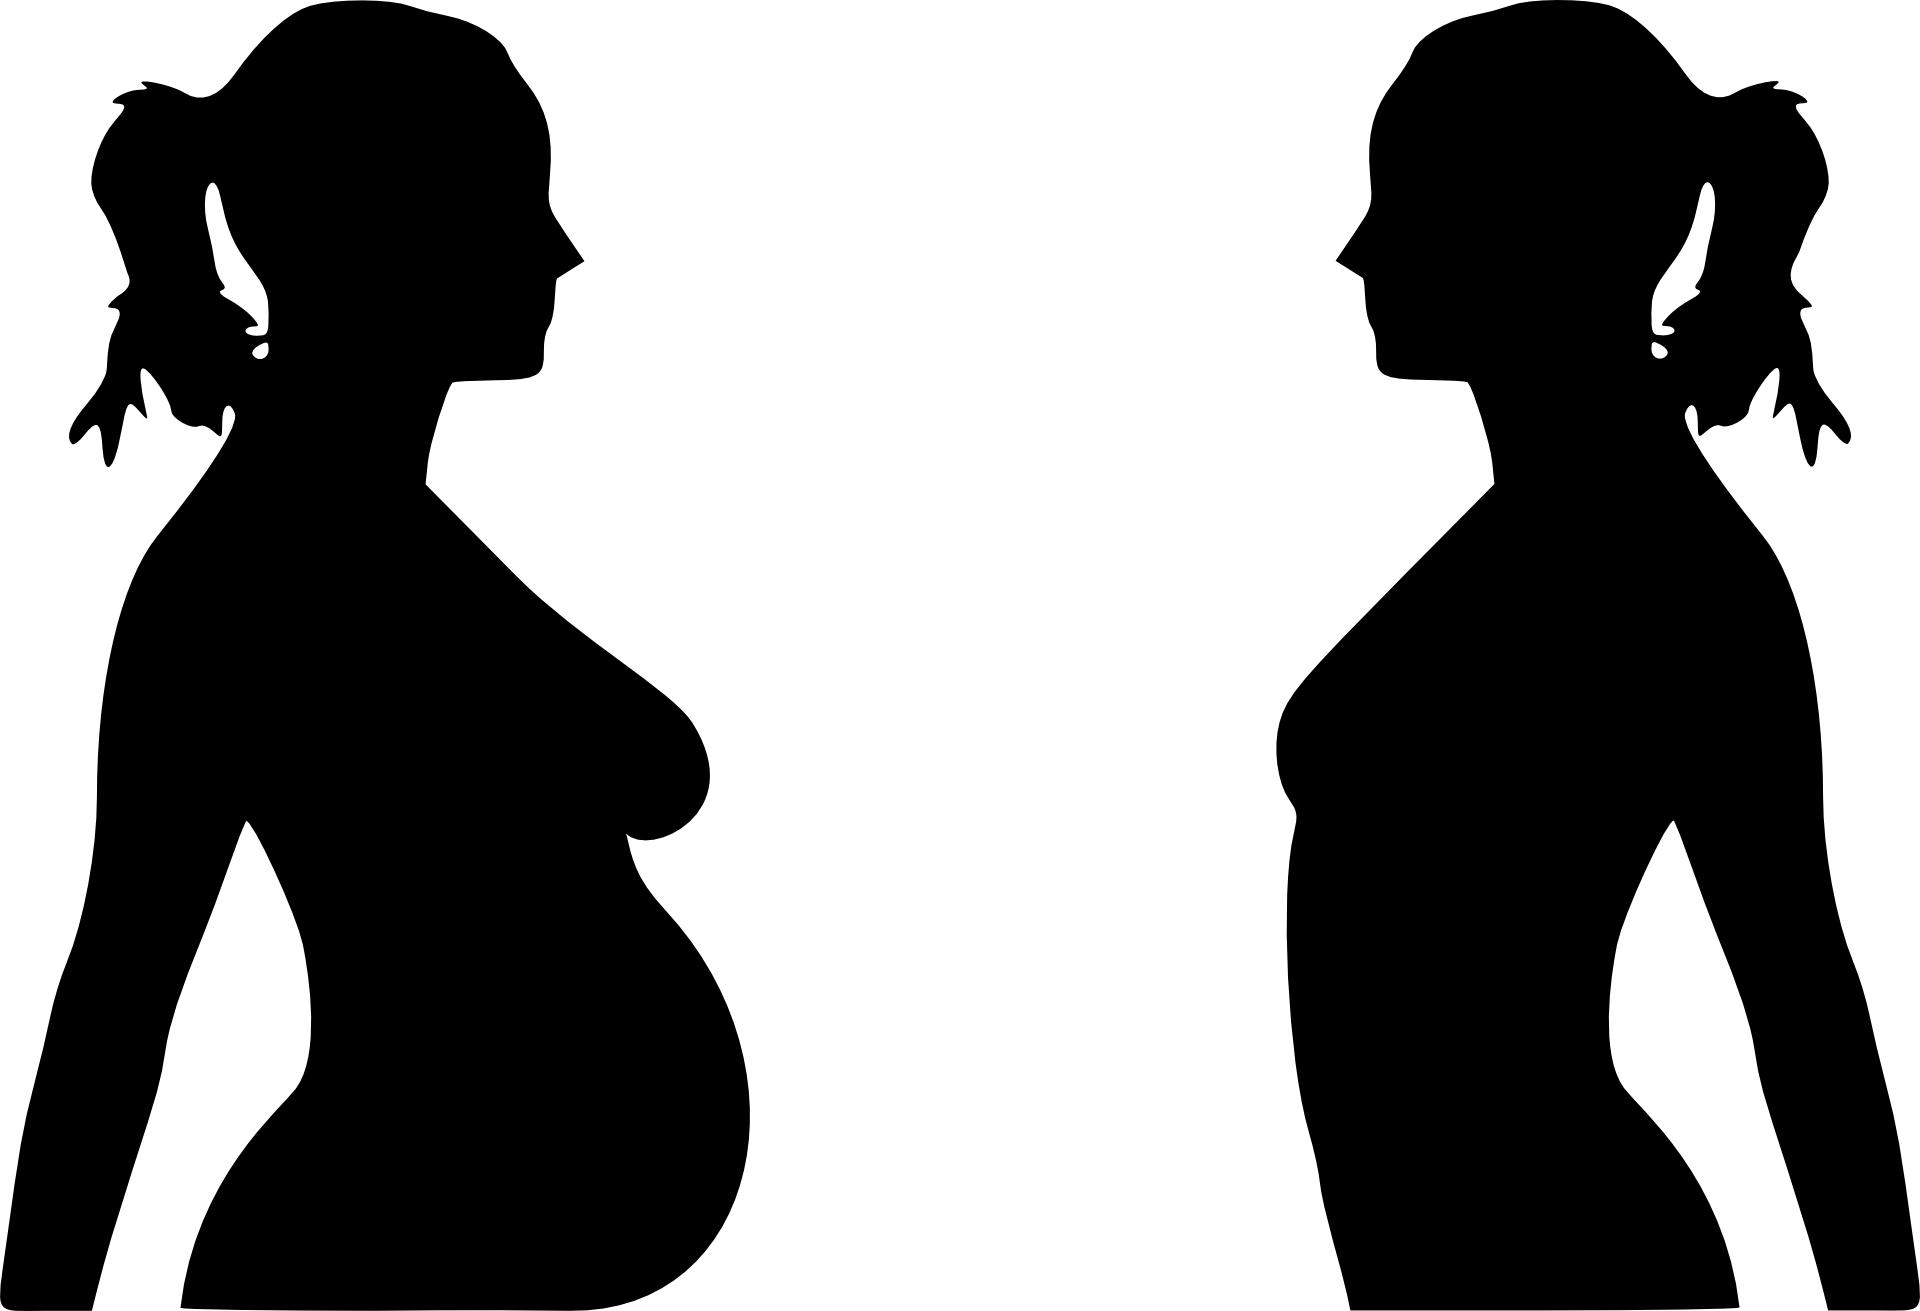 Pregnant Woman Silhouette Clip Art Free N21 free image.